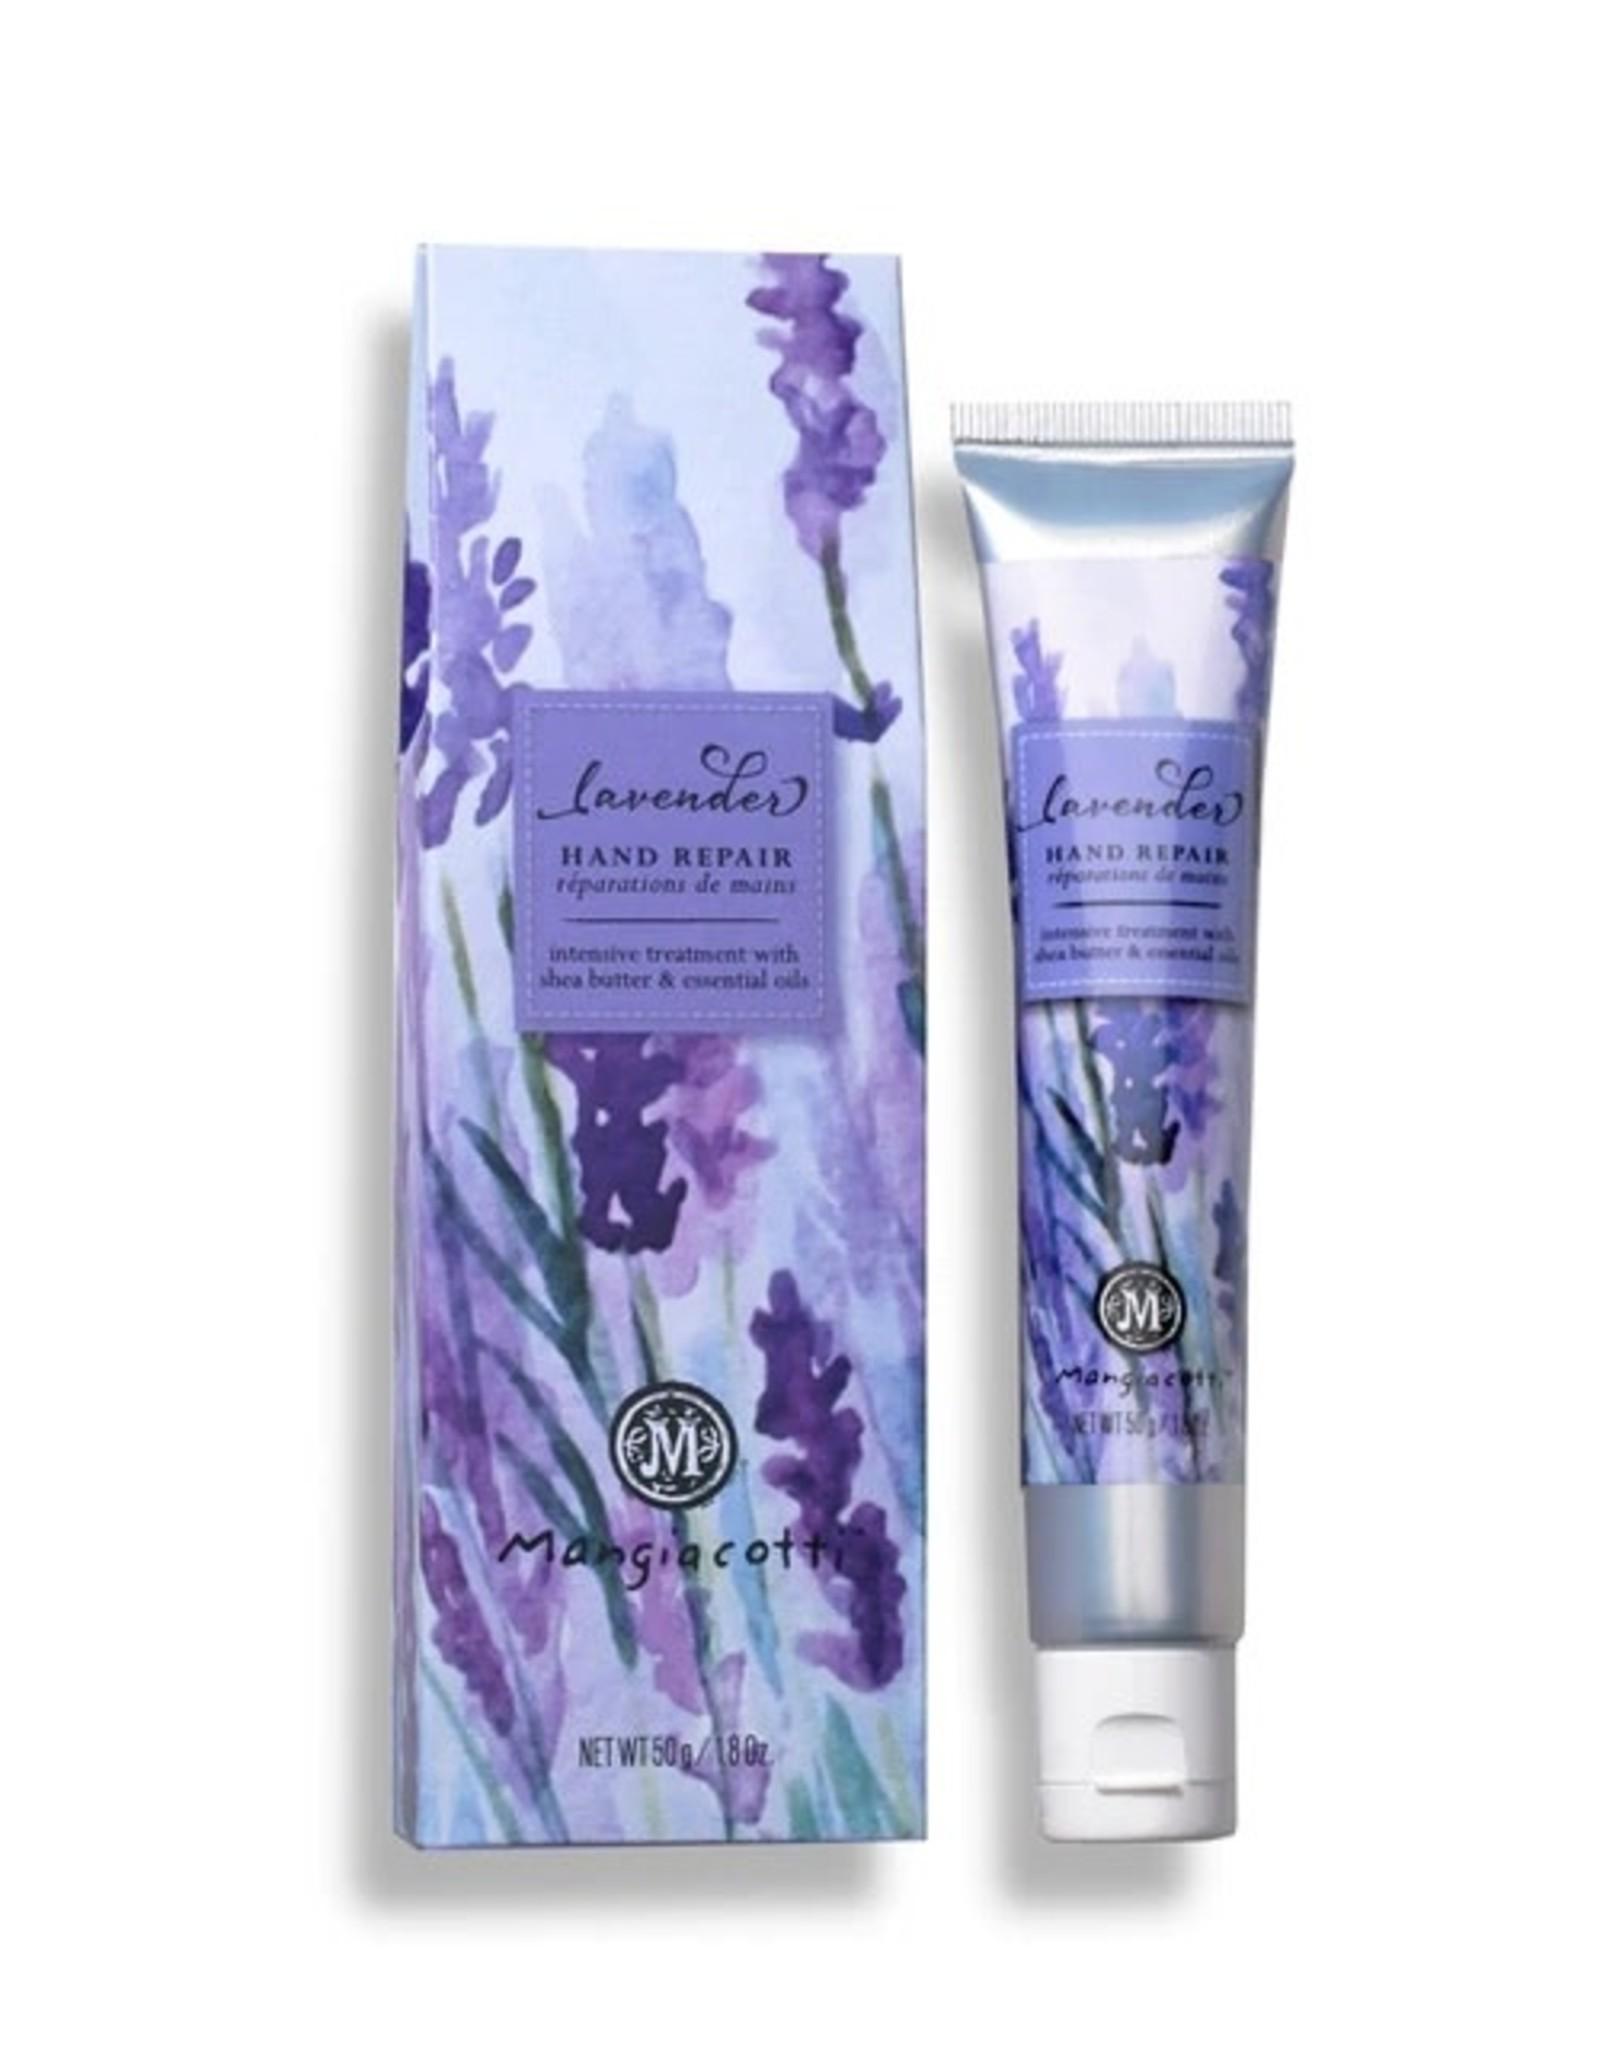 Mangicotti Mangiacotti Hand Repair Lotion Lavender